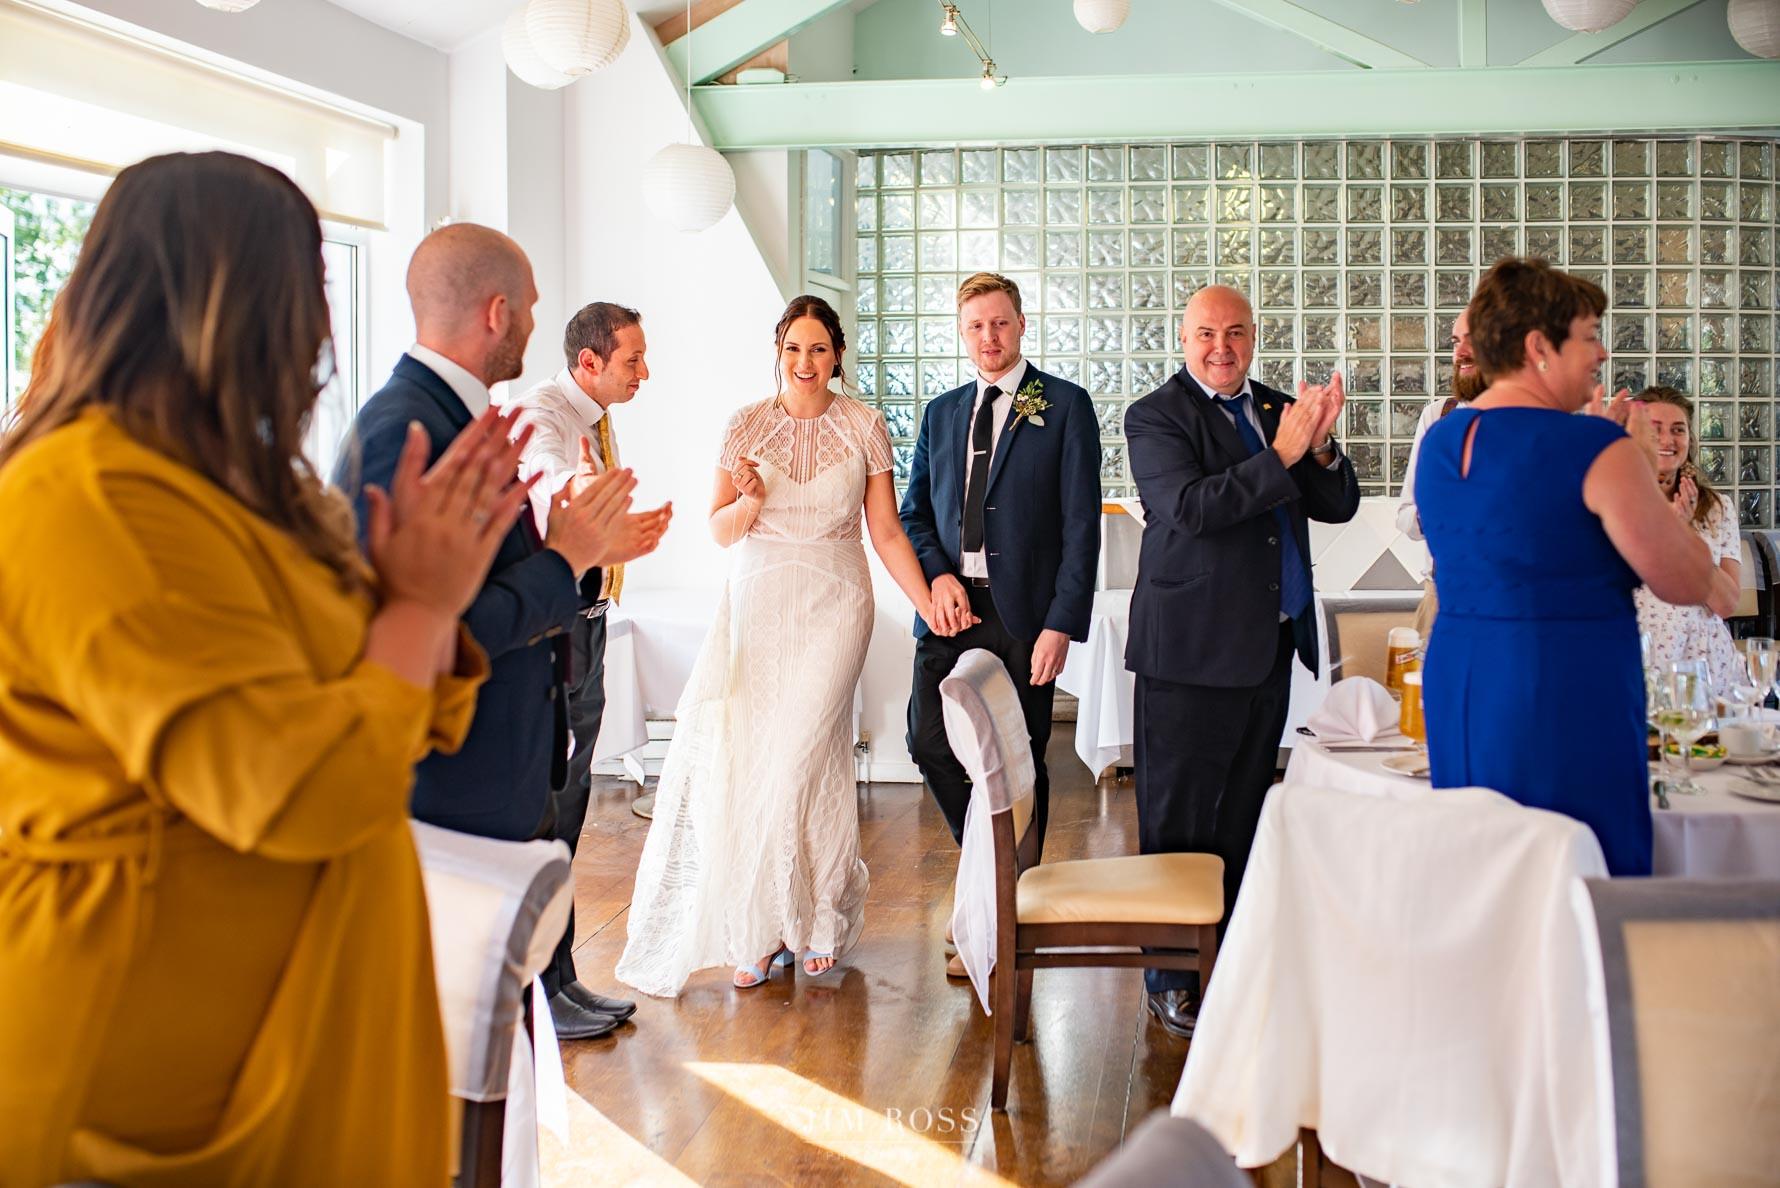 Bride and groom arrive for wedding breakfast